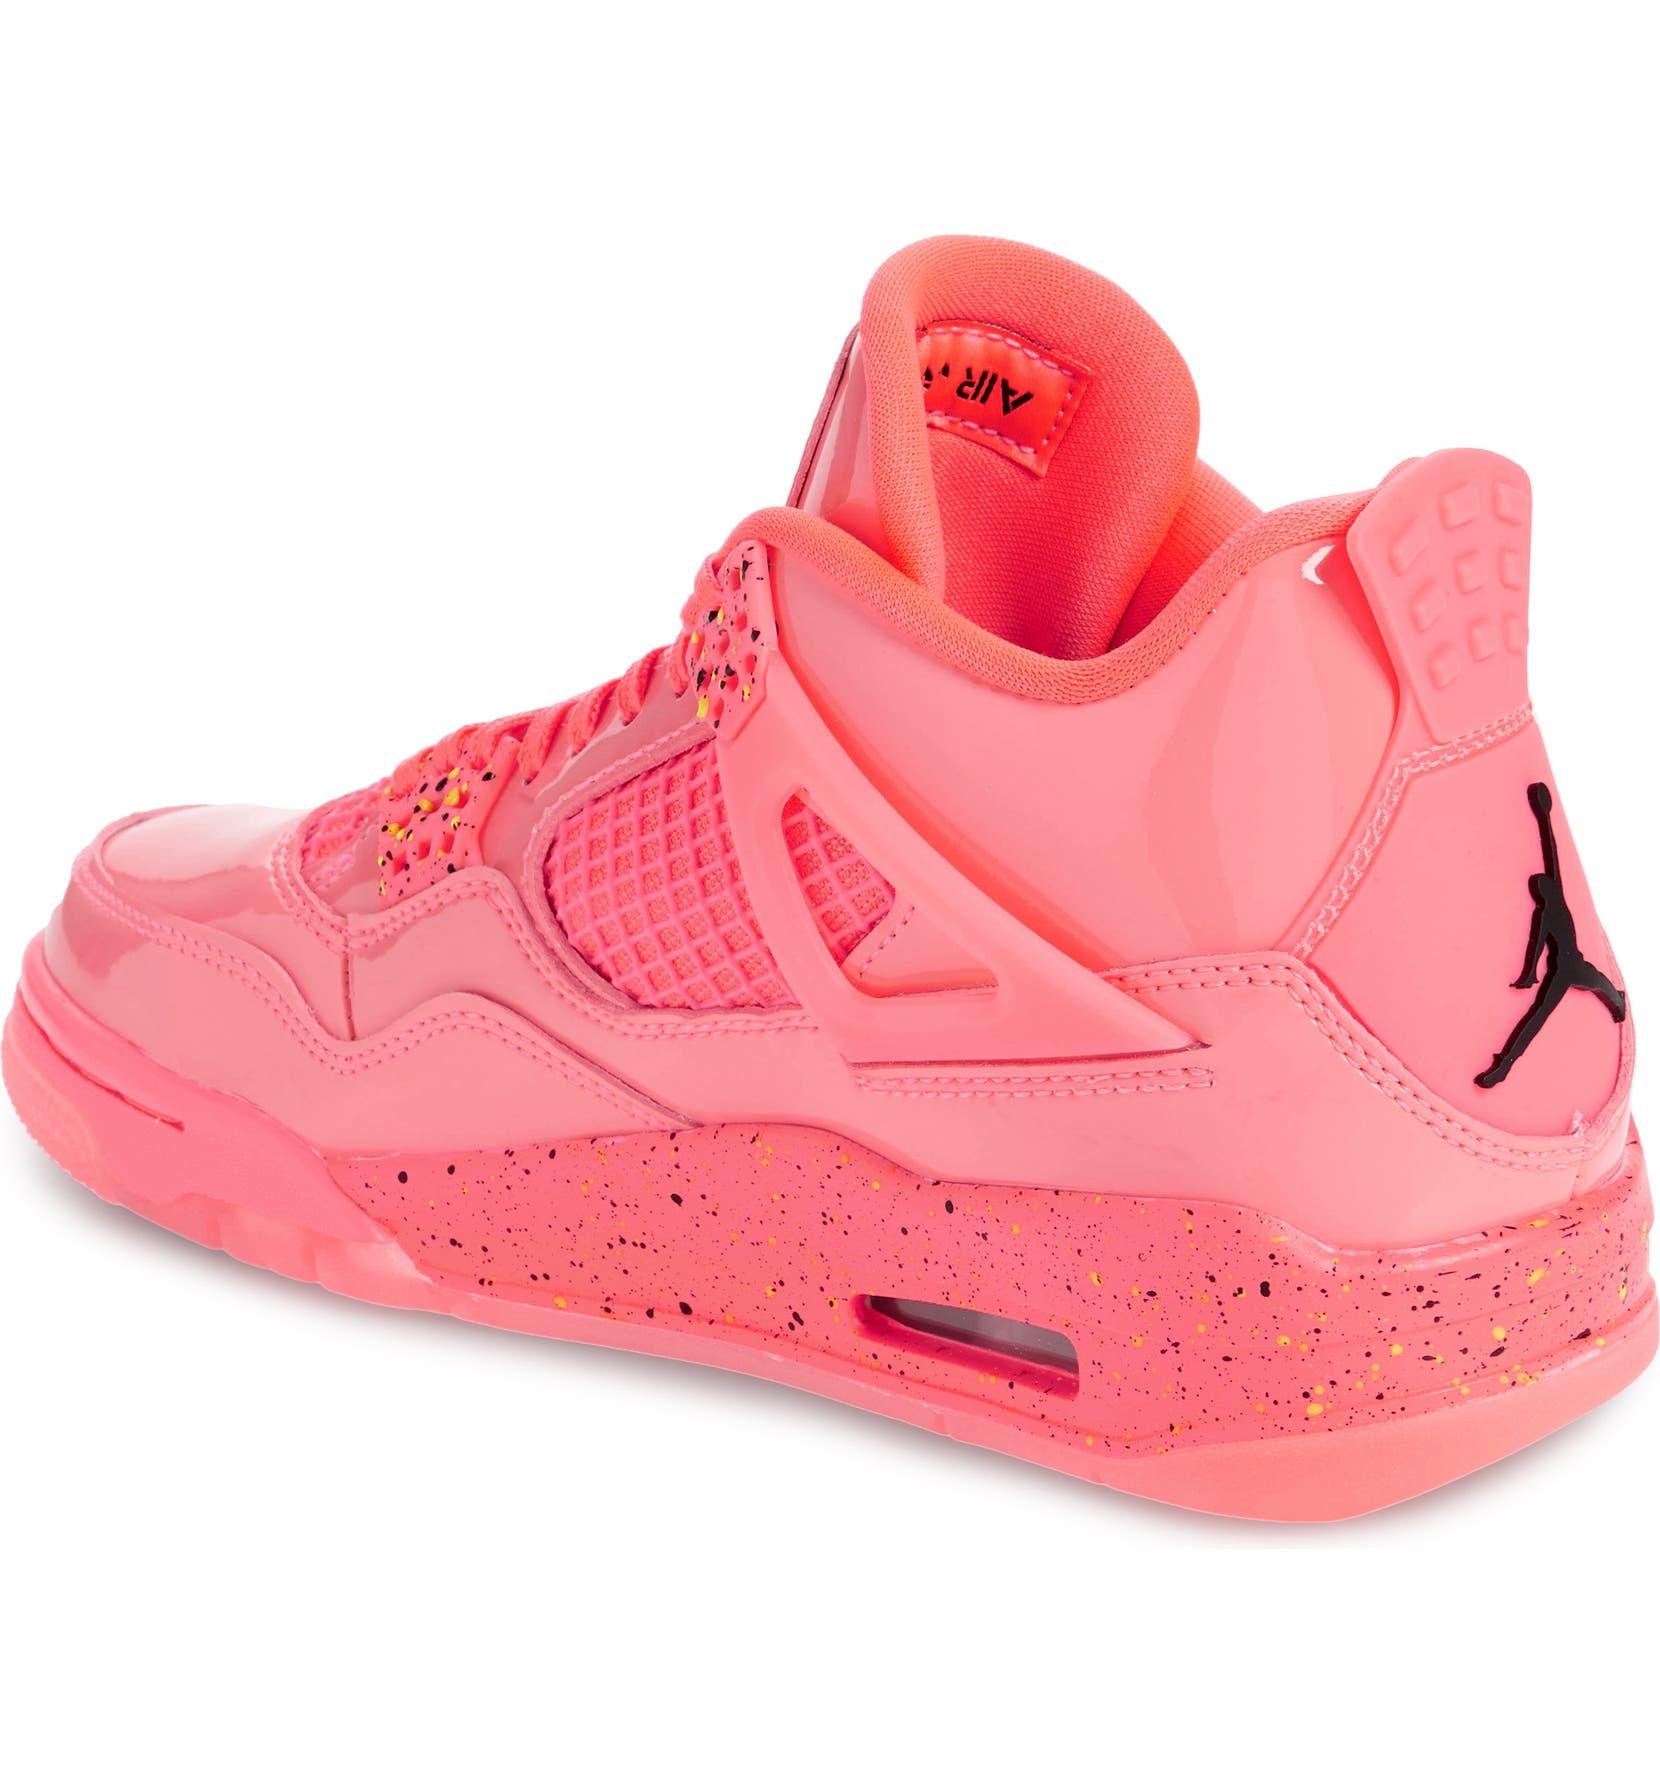 the latest e0cc9 f6aec Nike Air Jordan 4 Retro NRG High Top Sneaker